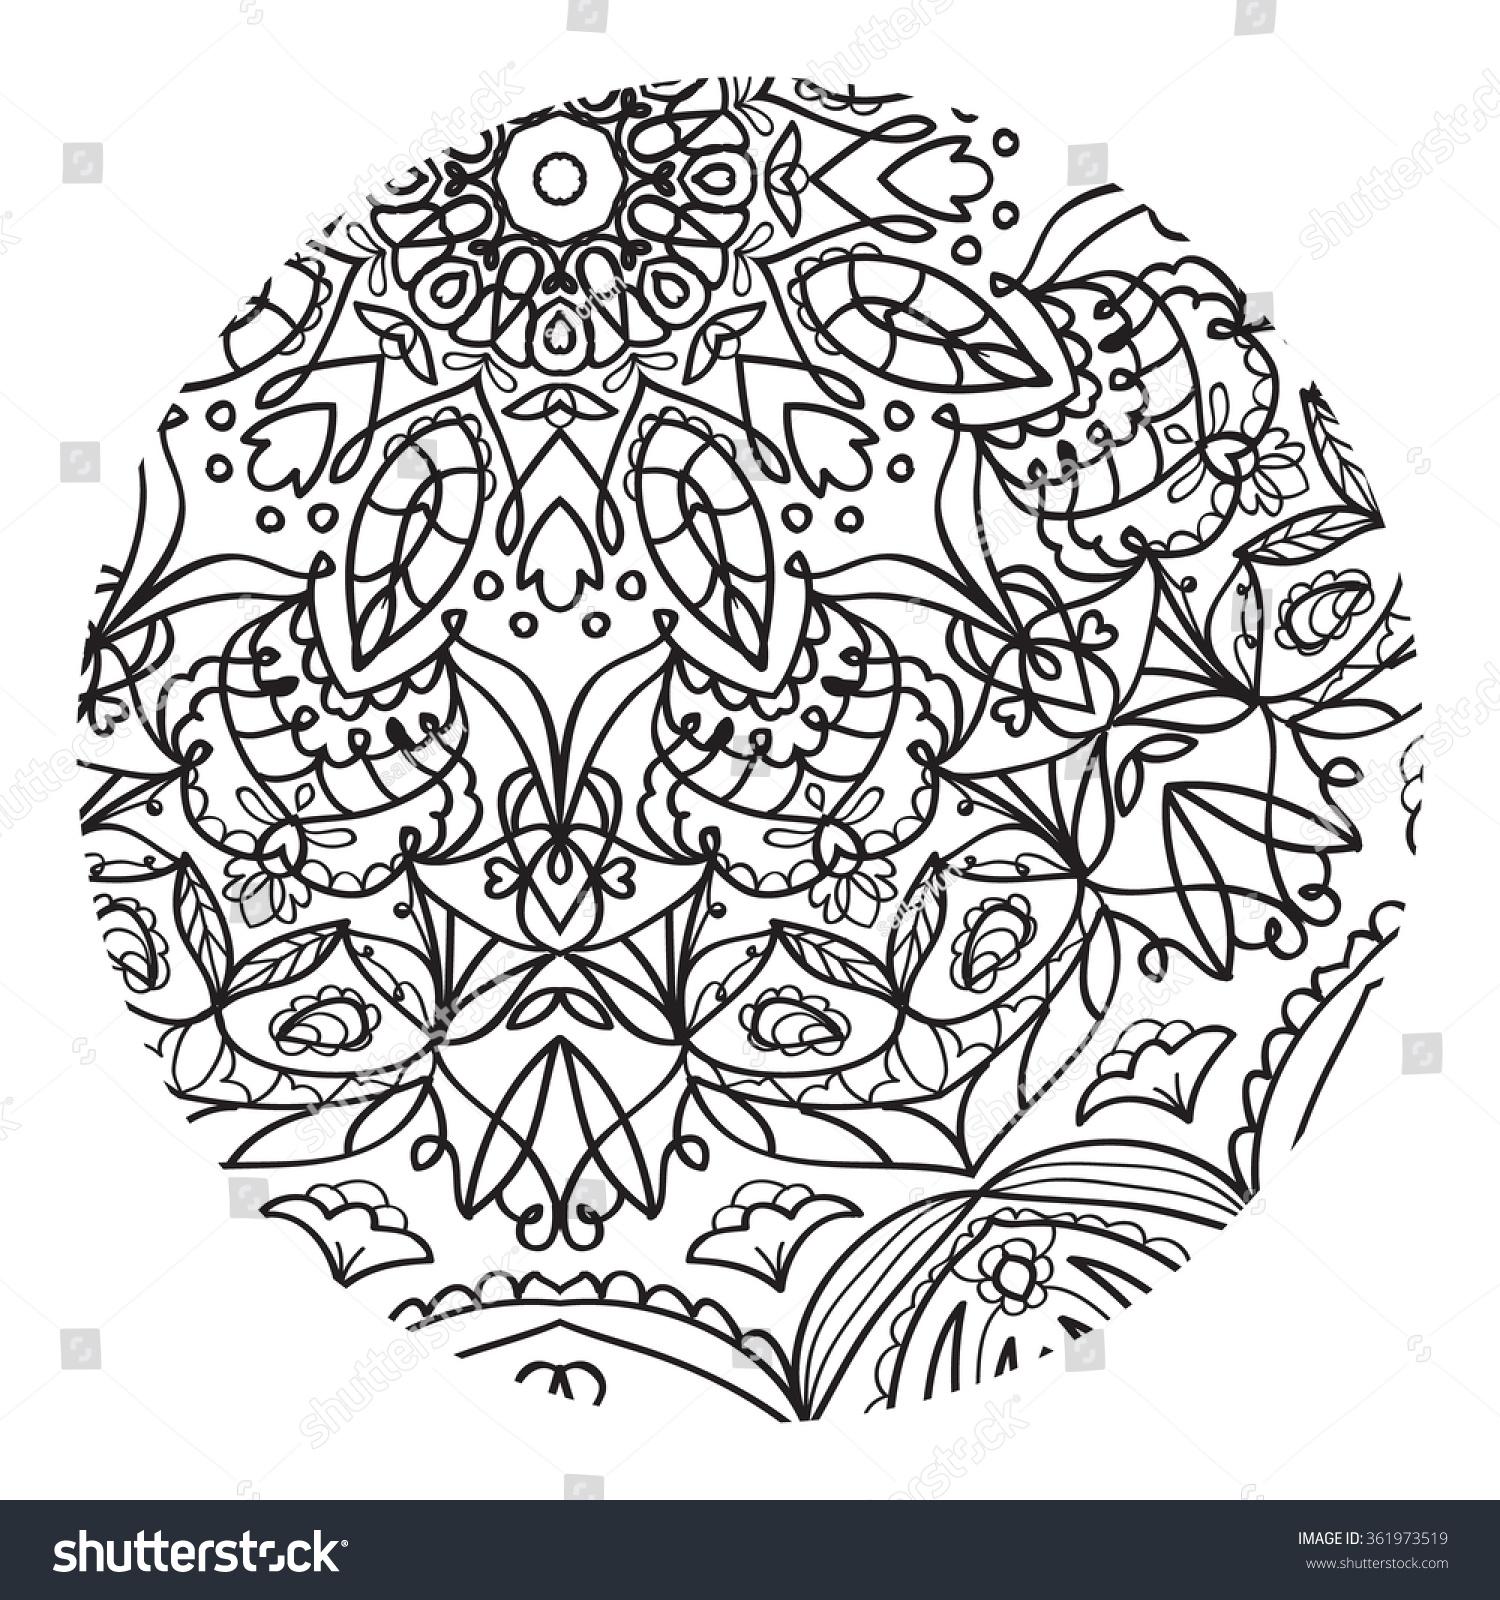 coloring for adults mandala pattern unique coloring book raster illustration a - Unique Coloring Books